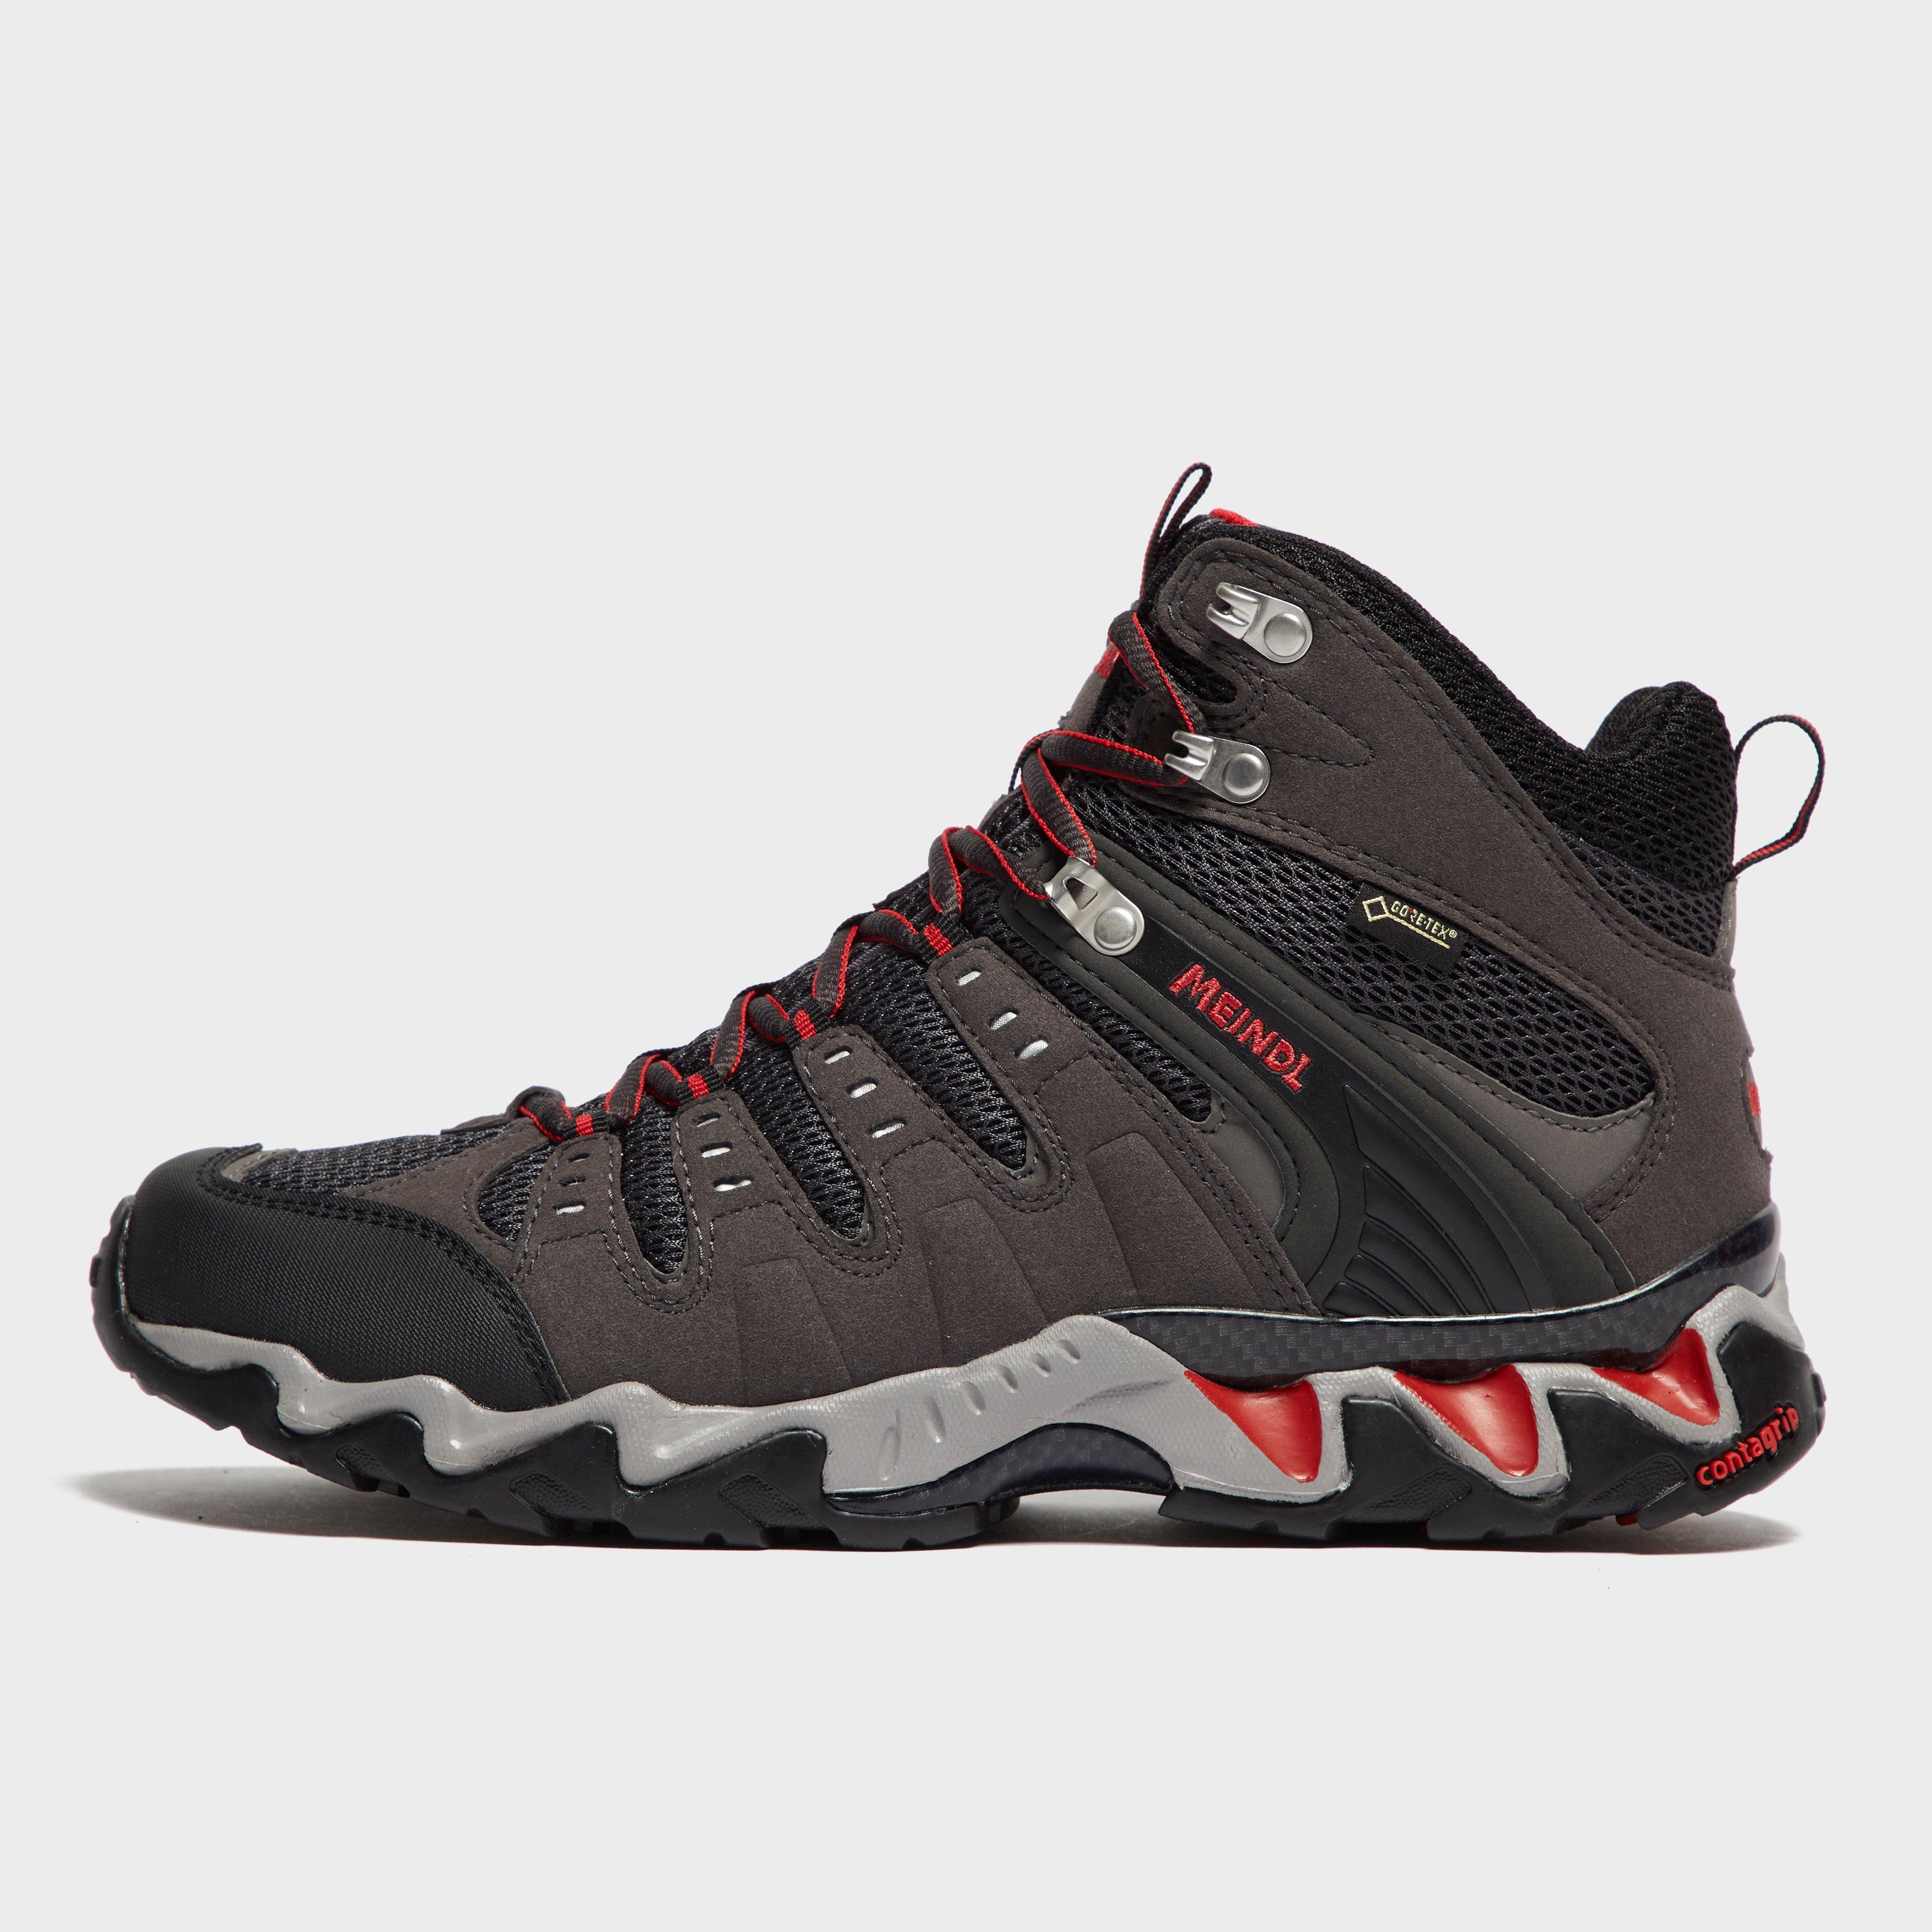 Meindl Meindl Mens Respond GORE-TEX Mid Boots - Black, Black